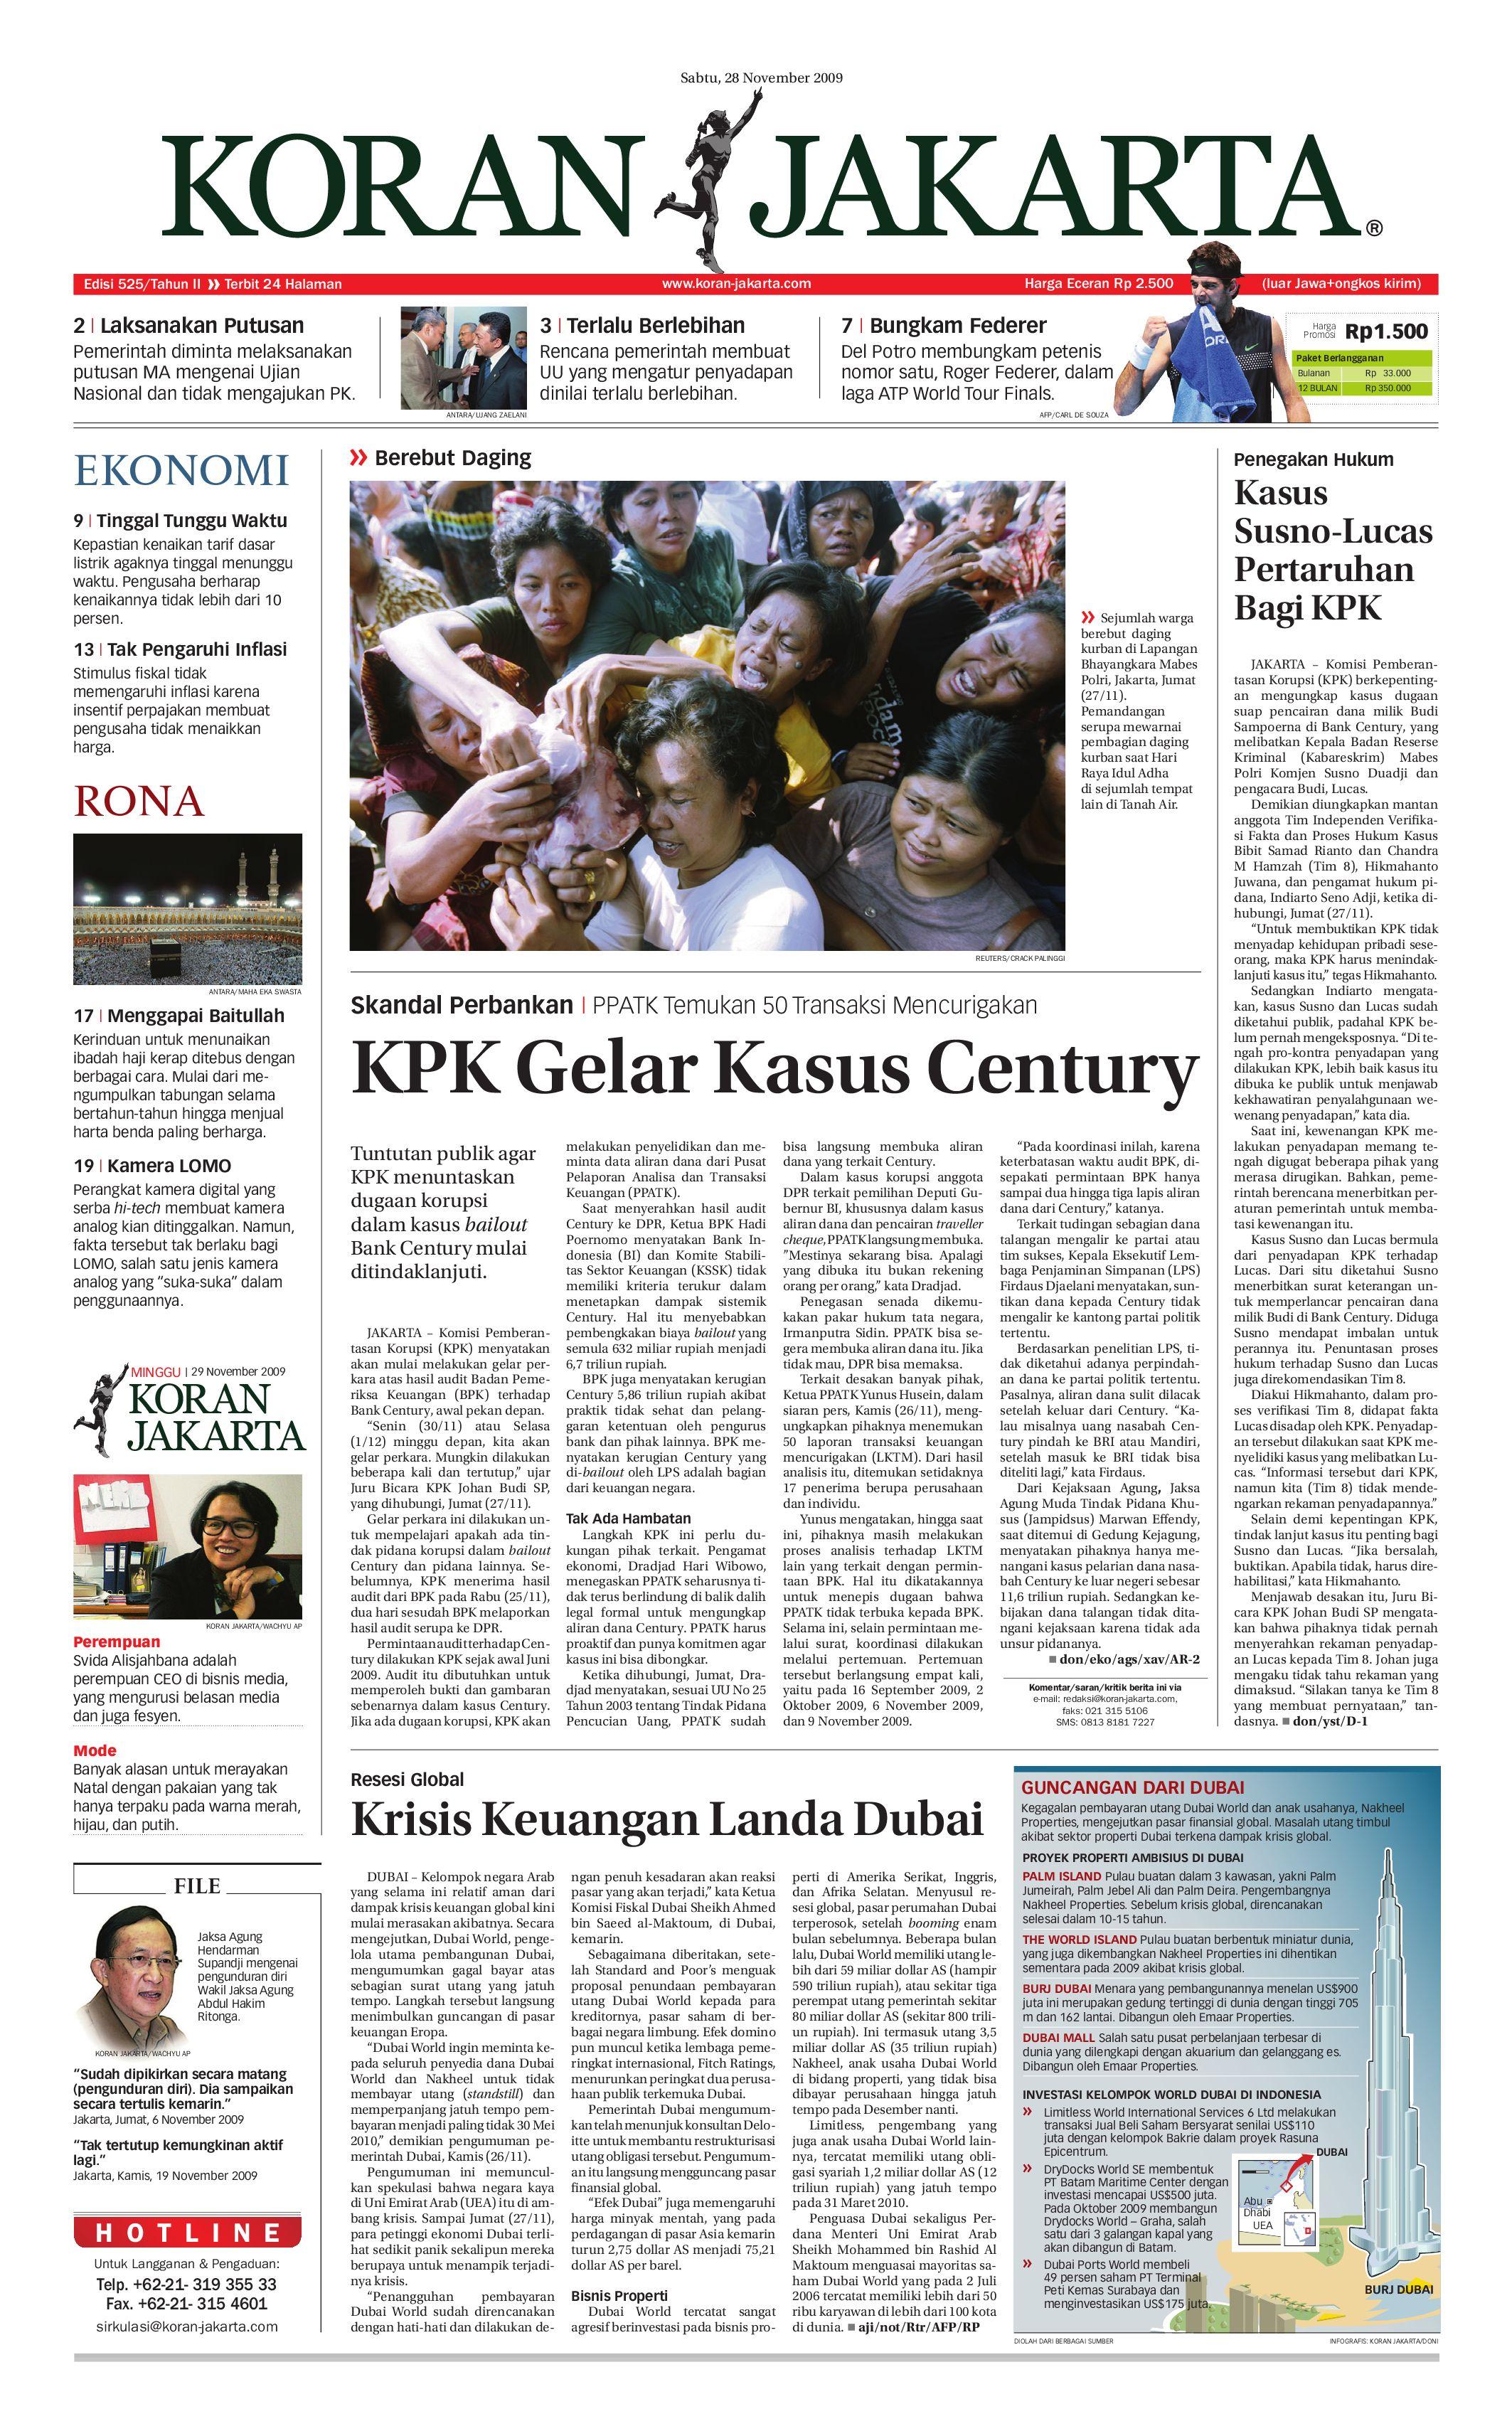 EDISI 525 - 28 NOVEMBER 2009 by PT. Berita Nusantara - issuu 86453a04cd